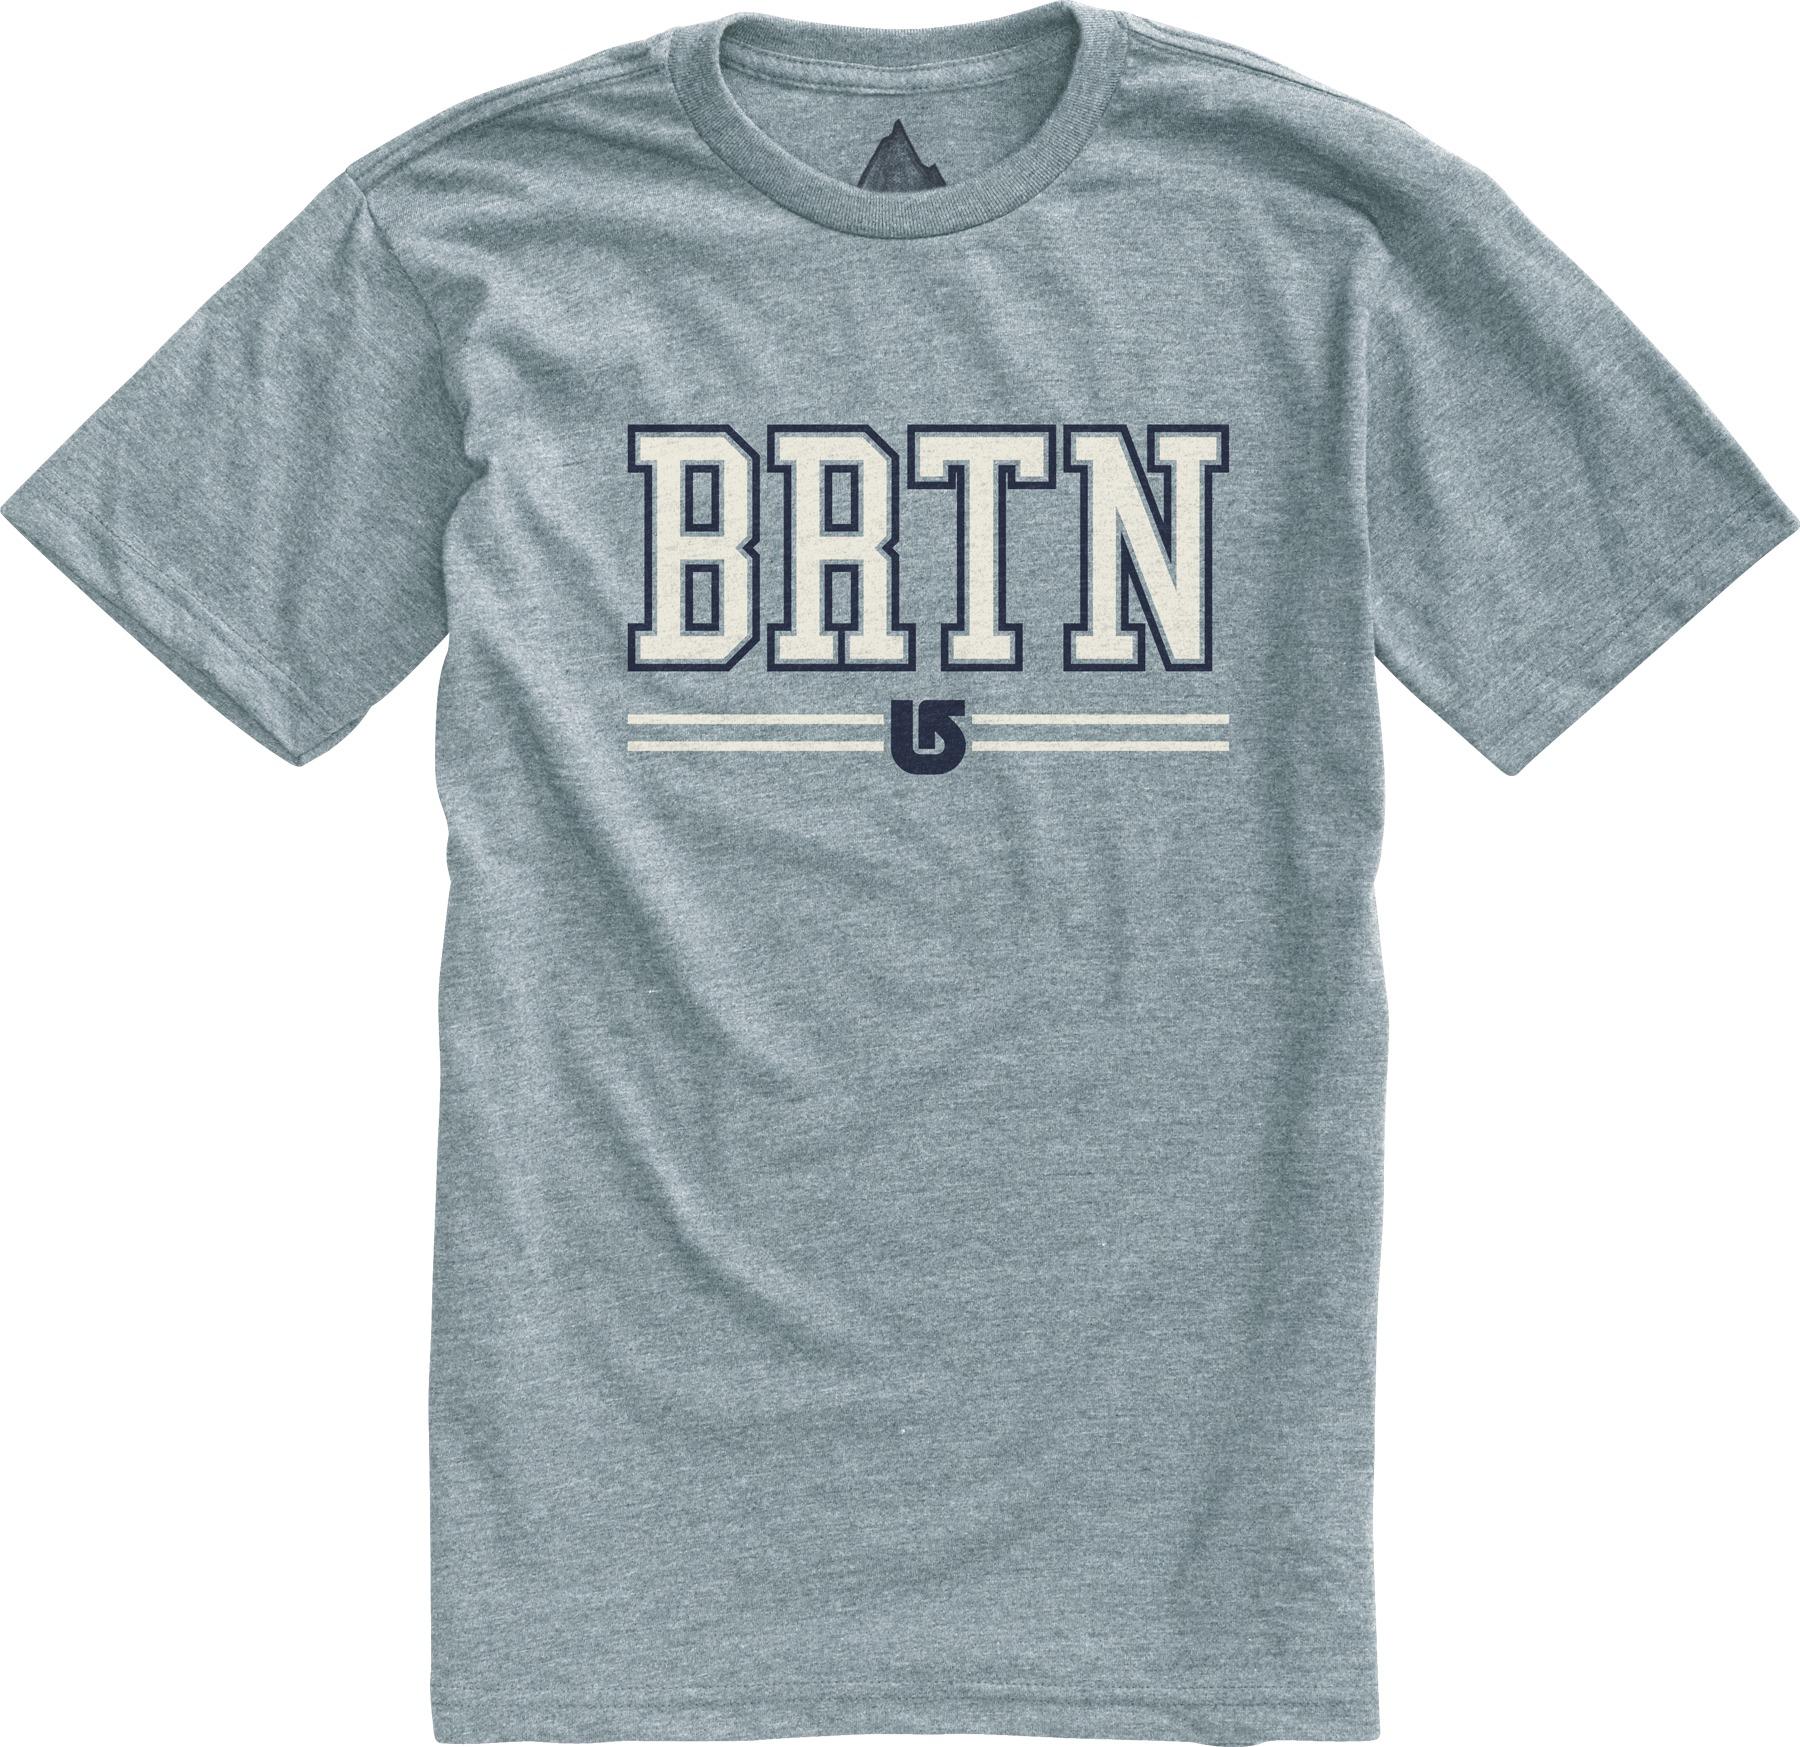 Koszulka Burton Champion Slim (Heather Slated)